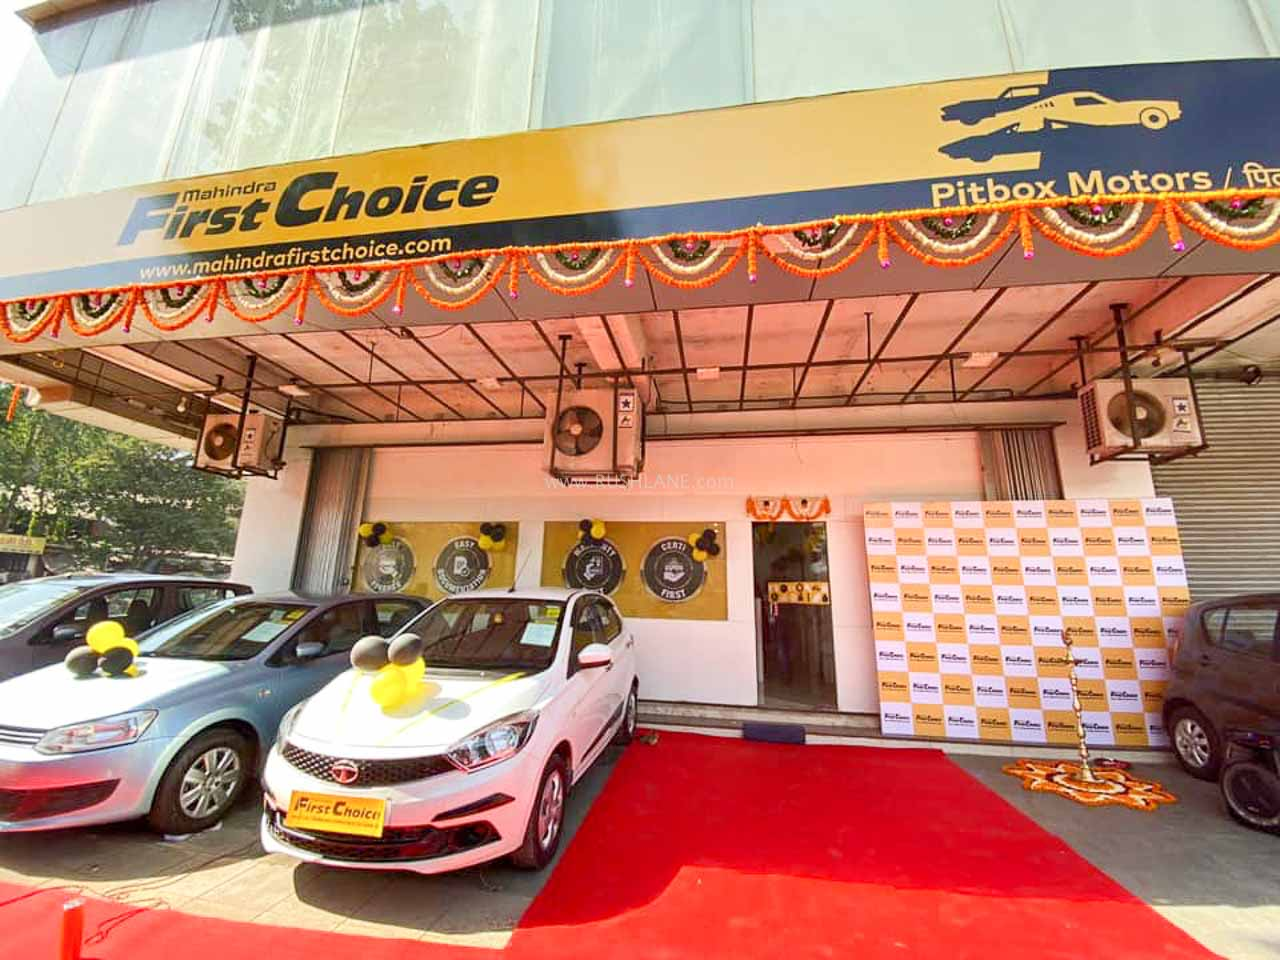 Mahindra First Choice store